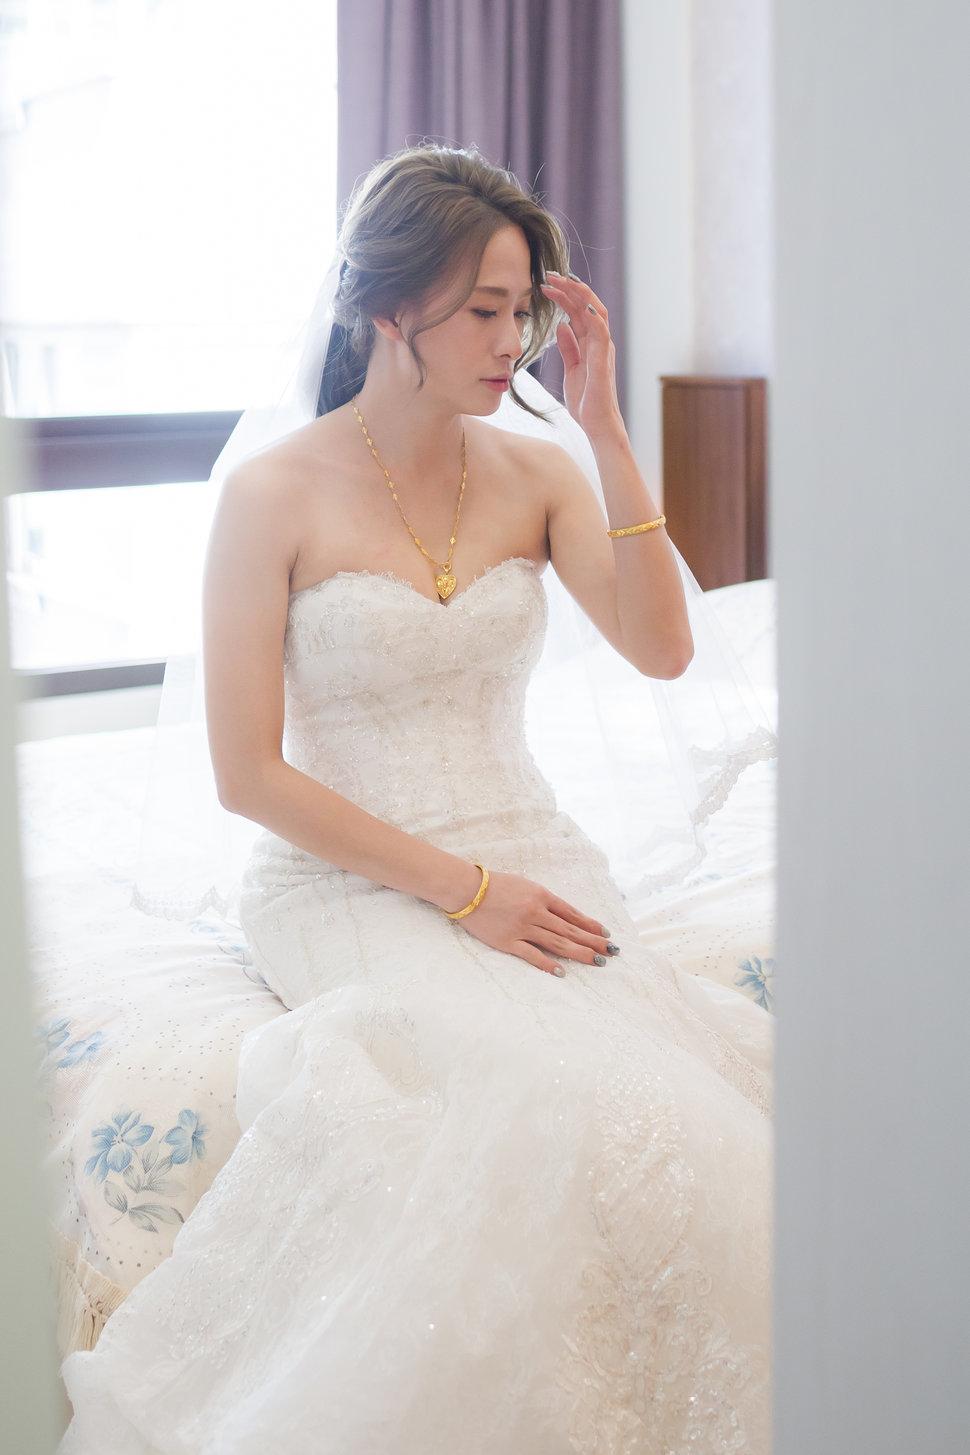 KU_21575 - 野孩子攝影工作室《結婚吧》